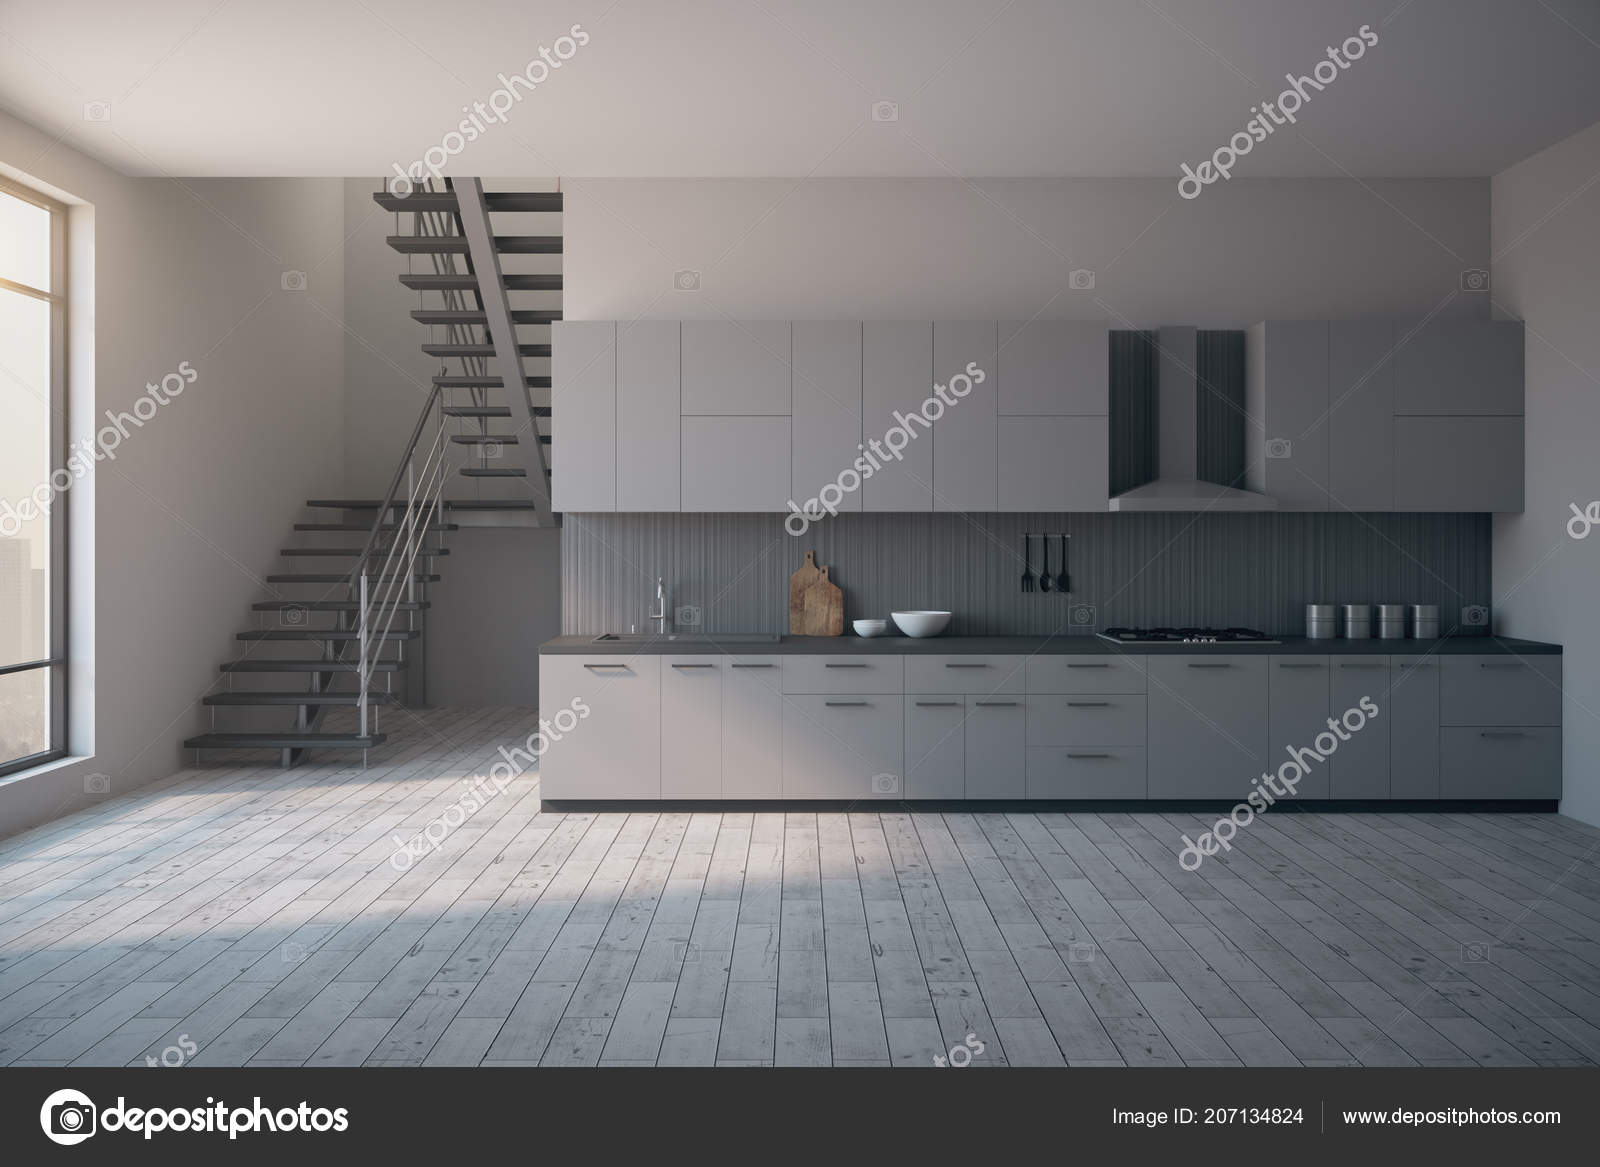 Loft keuken interieur met trappen stadszicht daglicht meubilair